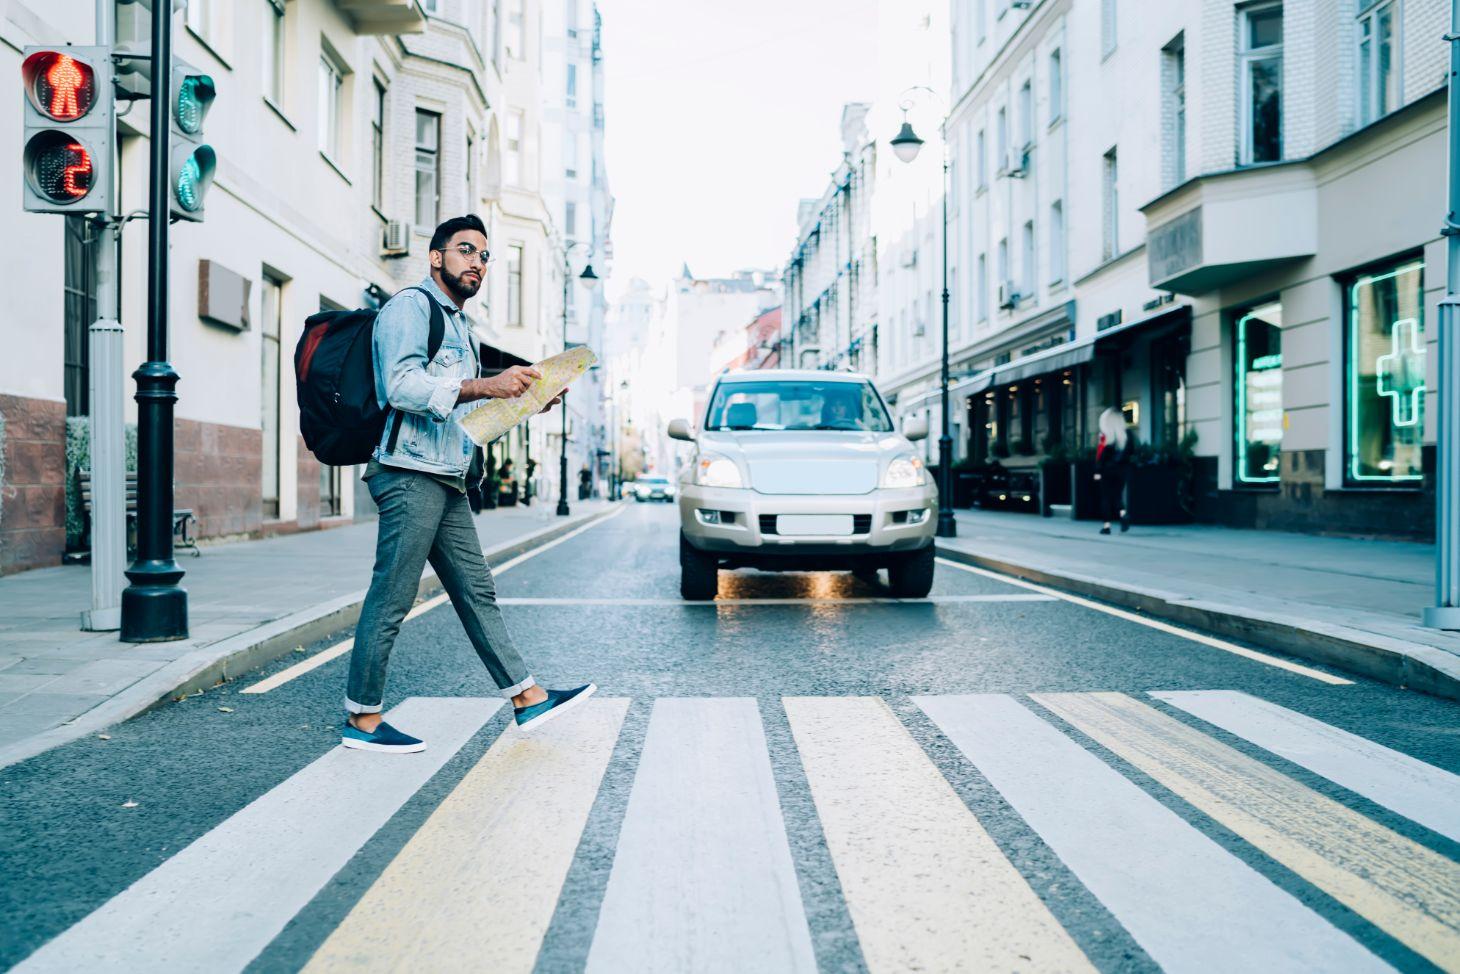 suv faixa de pedestre